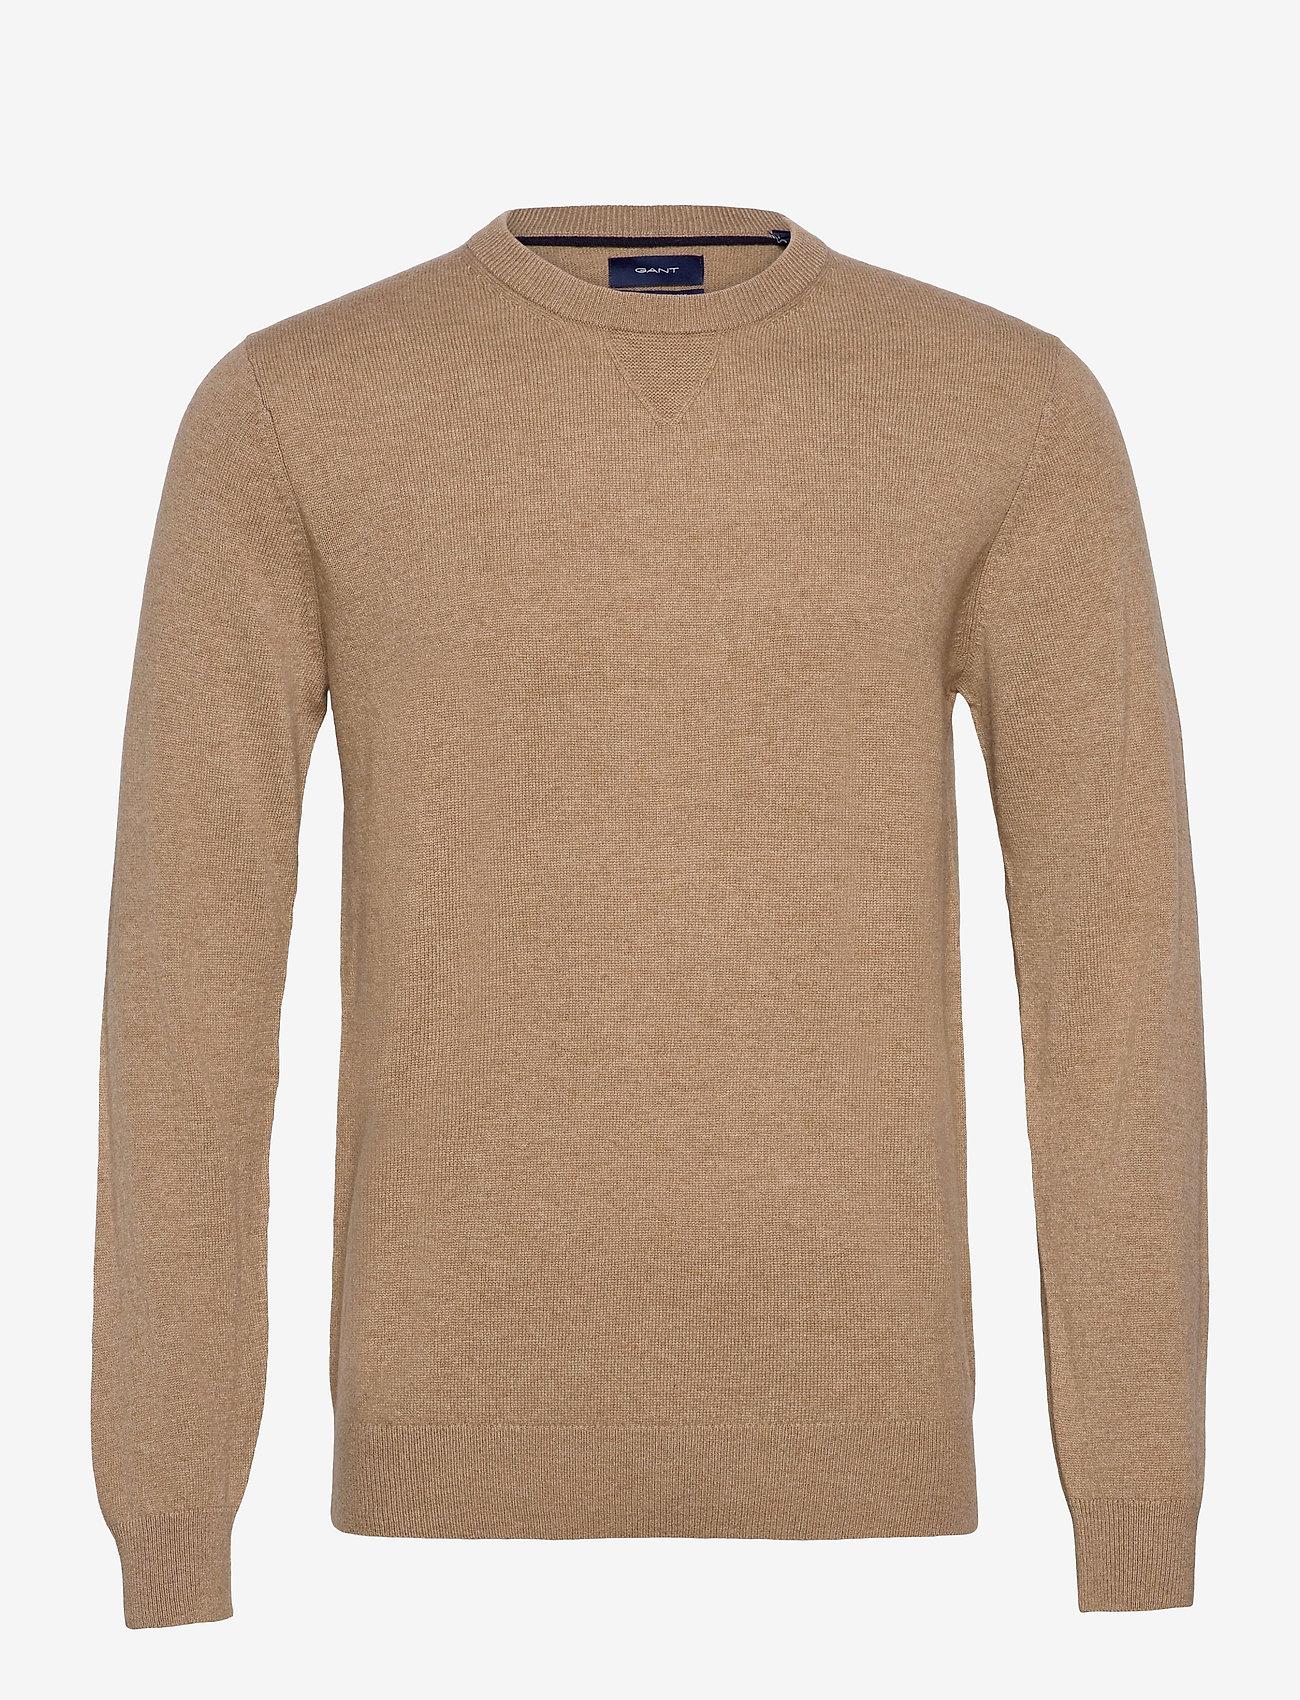 GANT - D1. WOOL CASHMERE  C-NECK - basic knitwear - warm khaki - 0